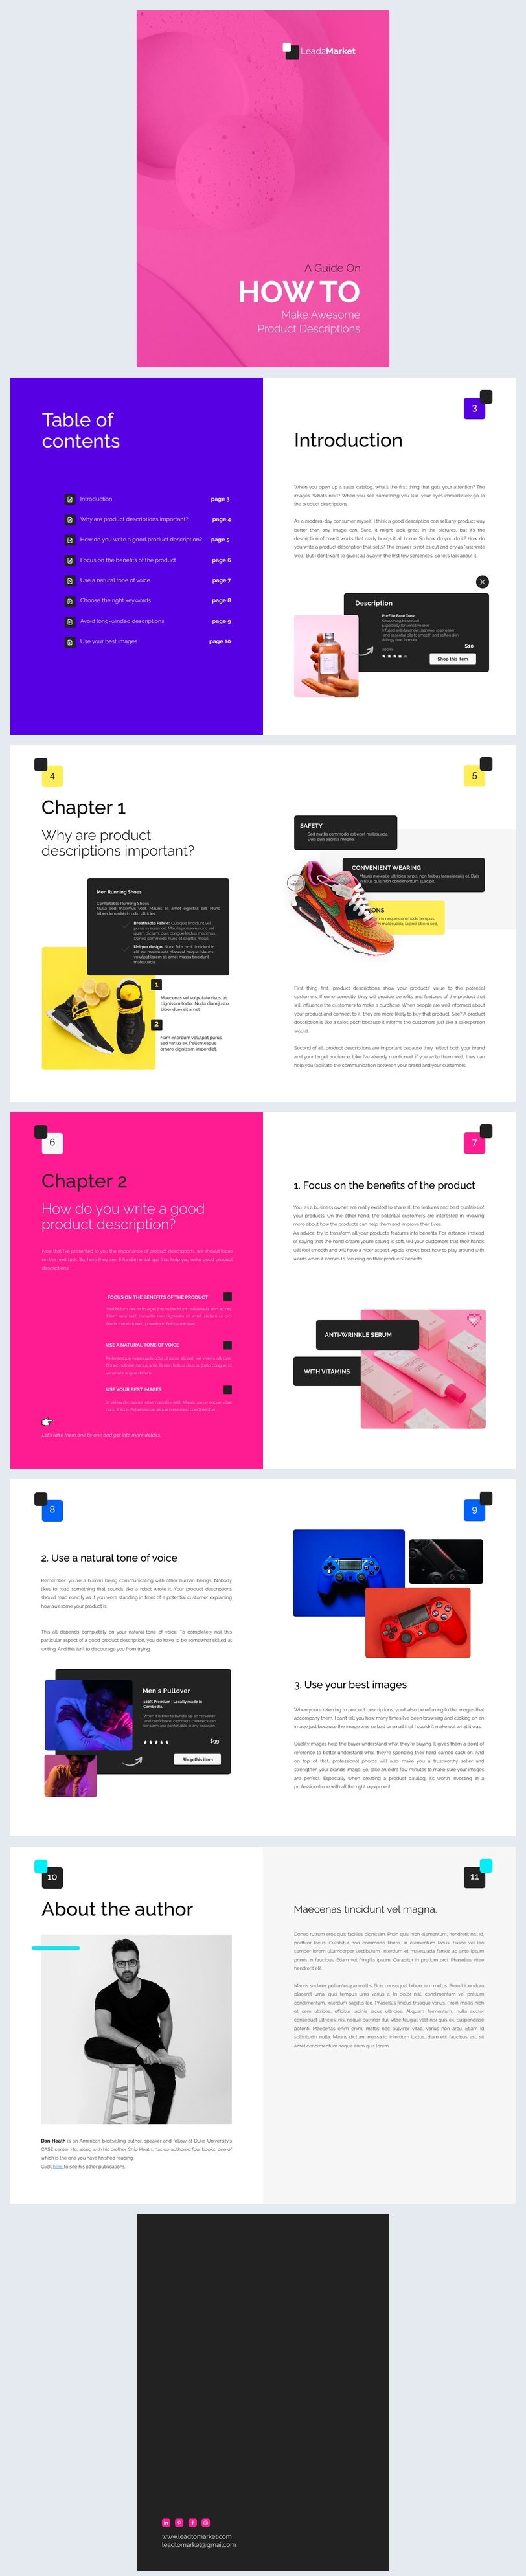 Customizable Product Marketing Ebook Design Example